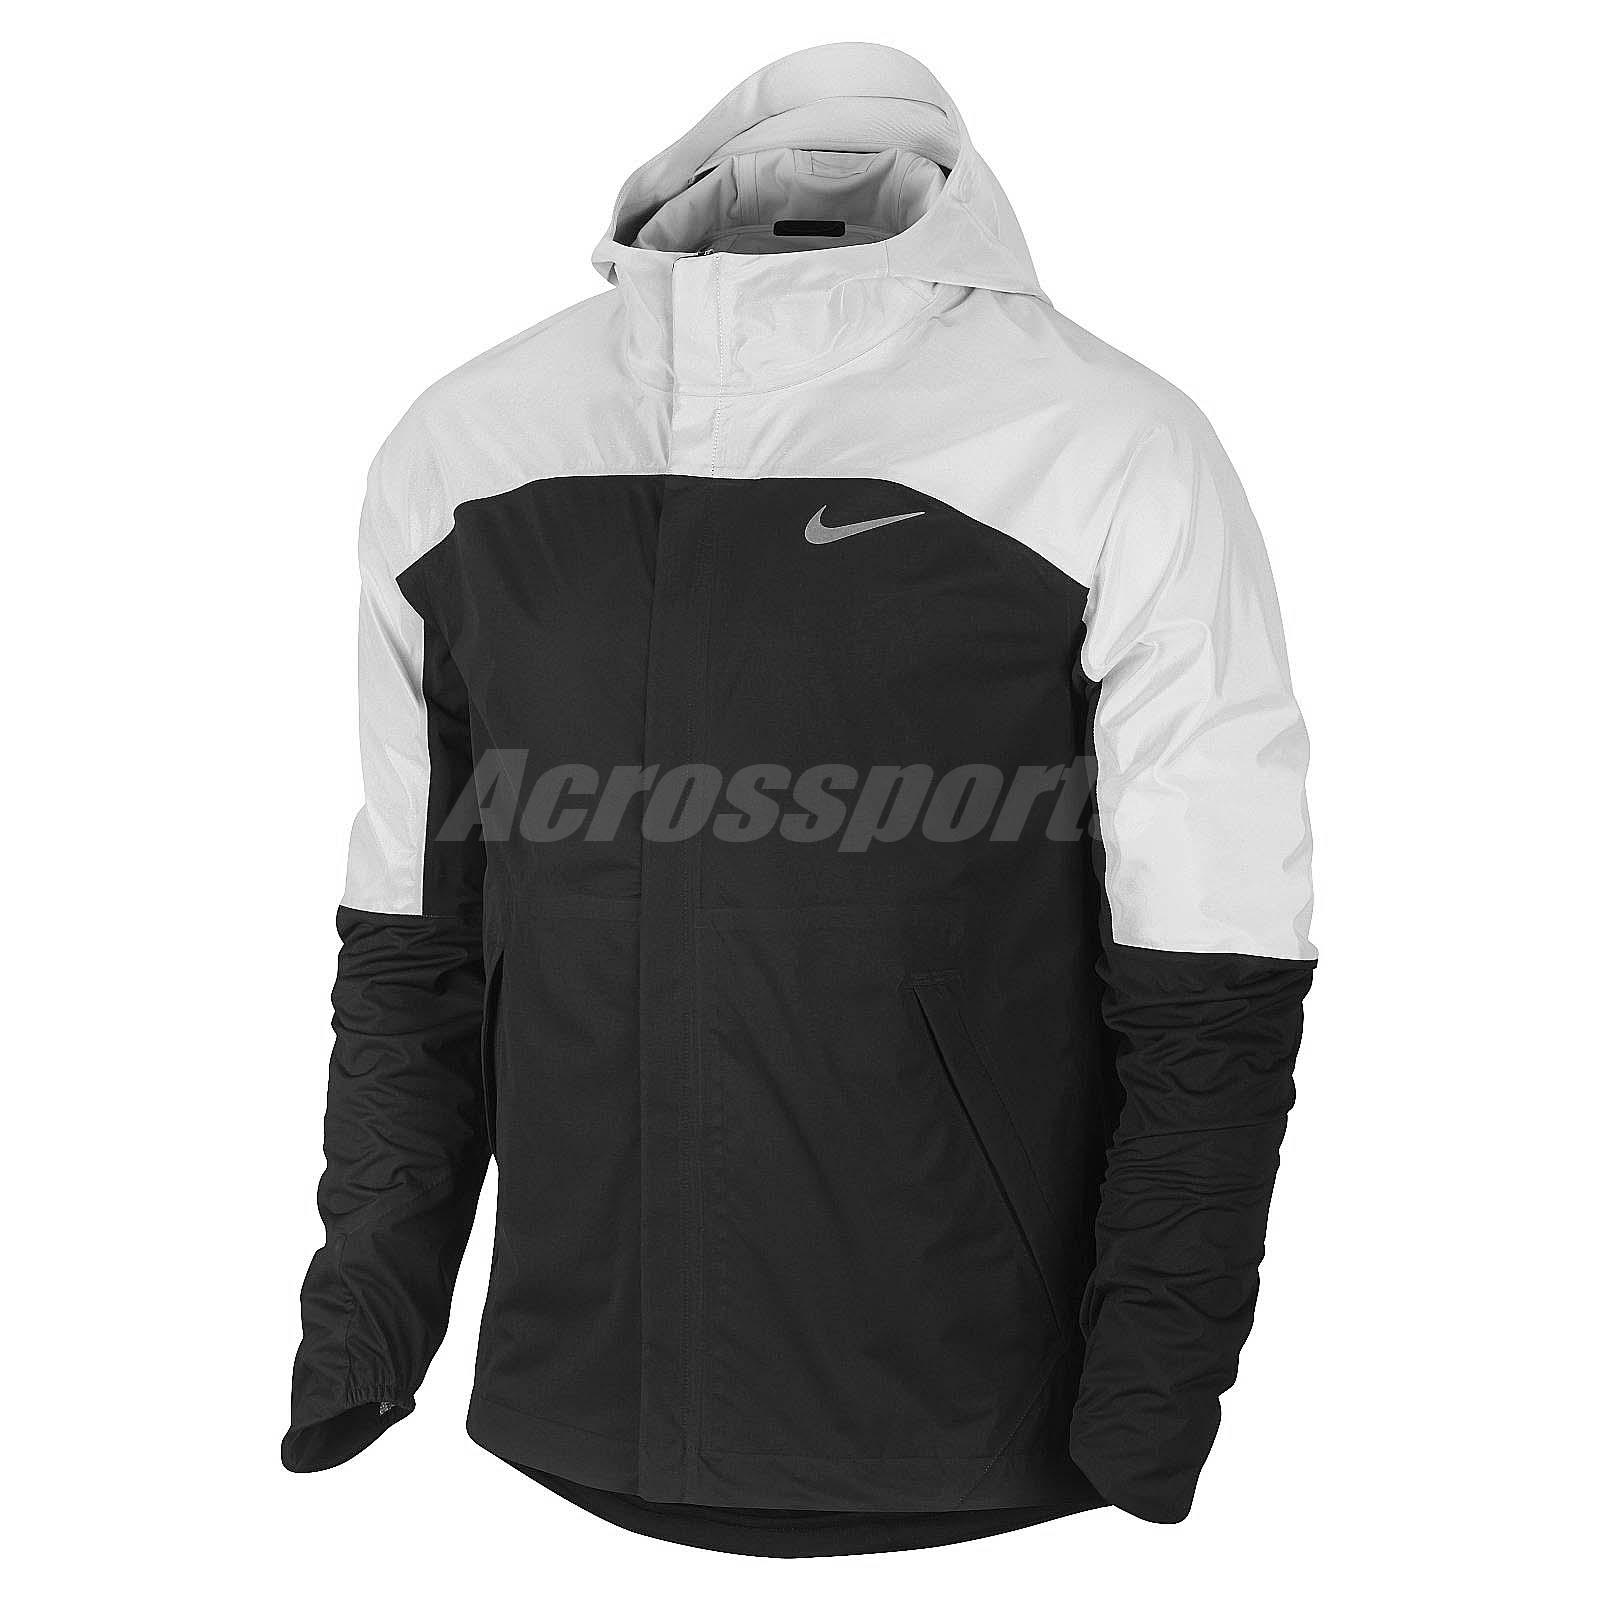 Nike jacket flash - Asian Size Nike As Shieldrunner Flash Mens Windbreaker Jacket Hoodie 688746 010